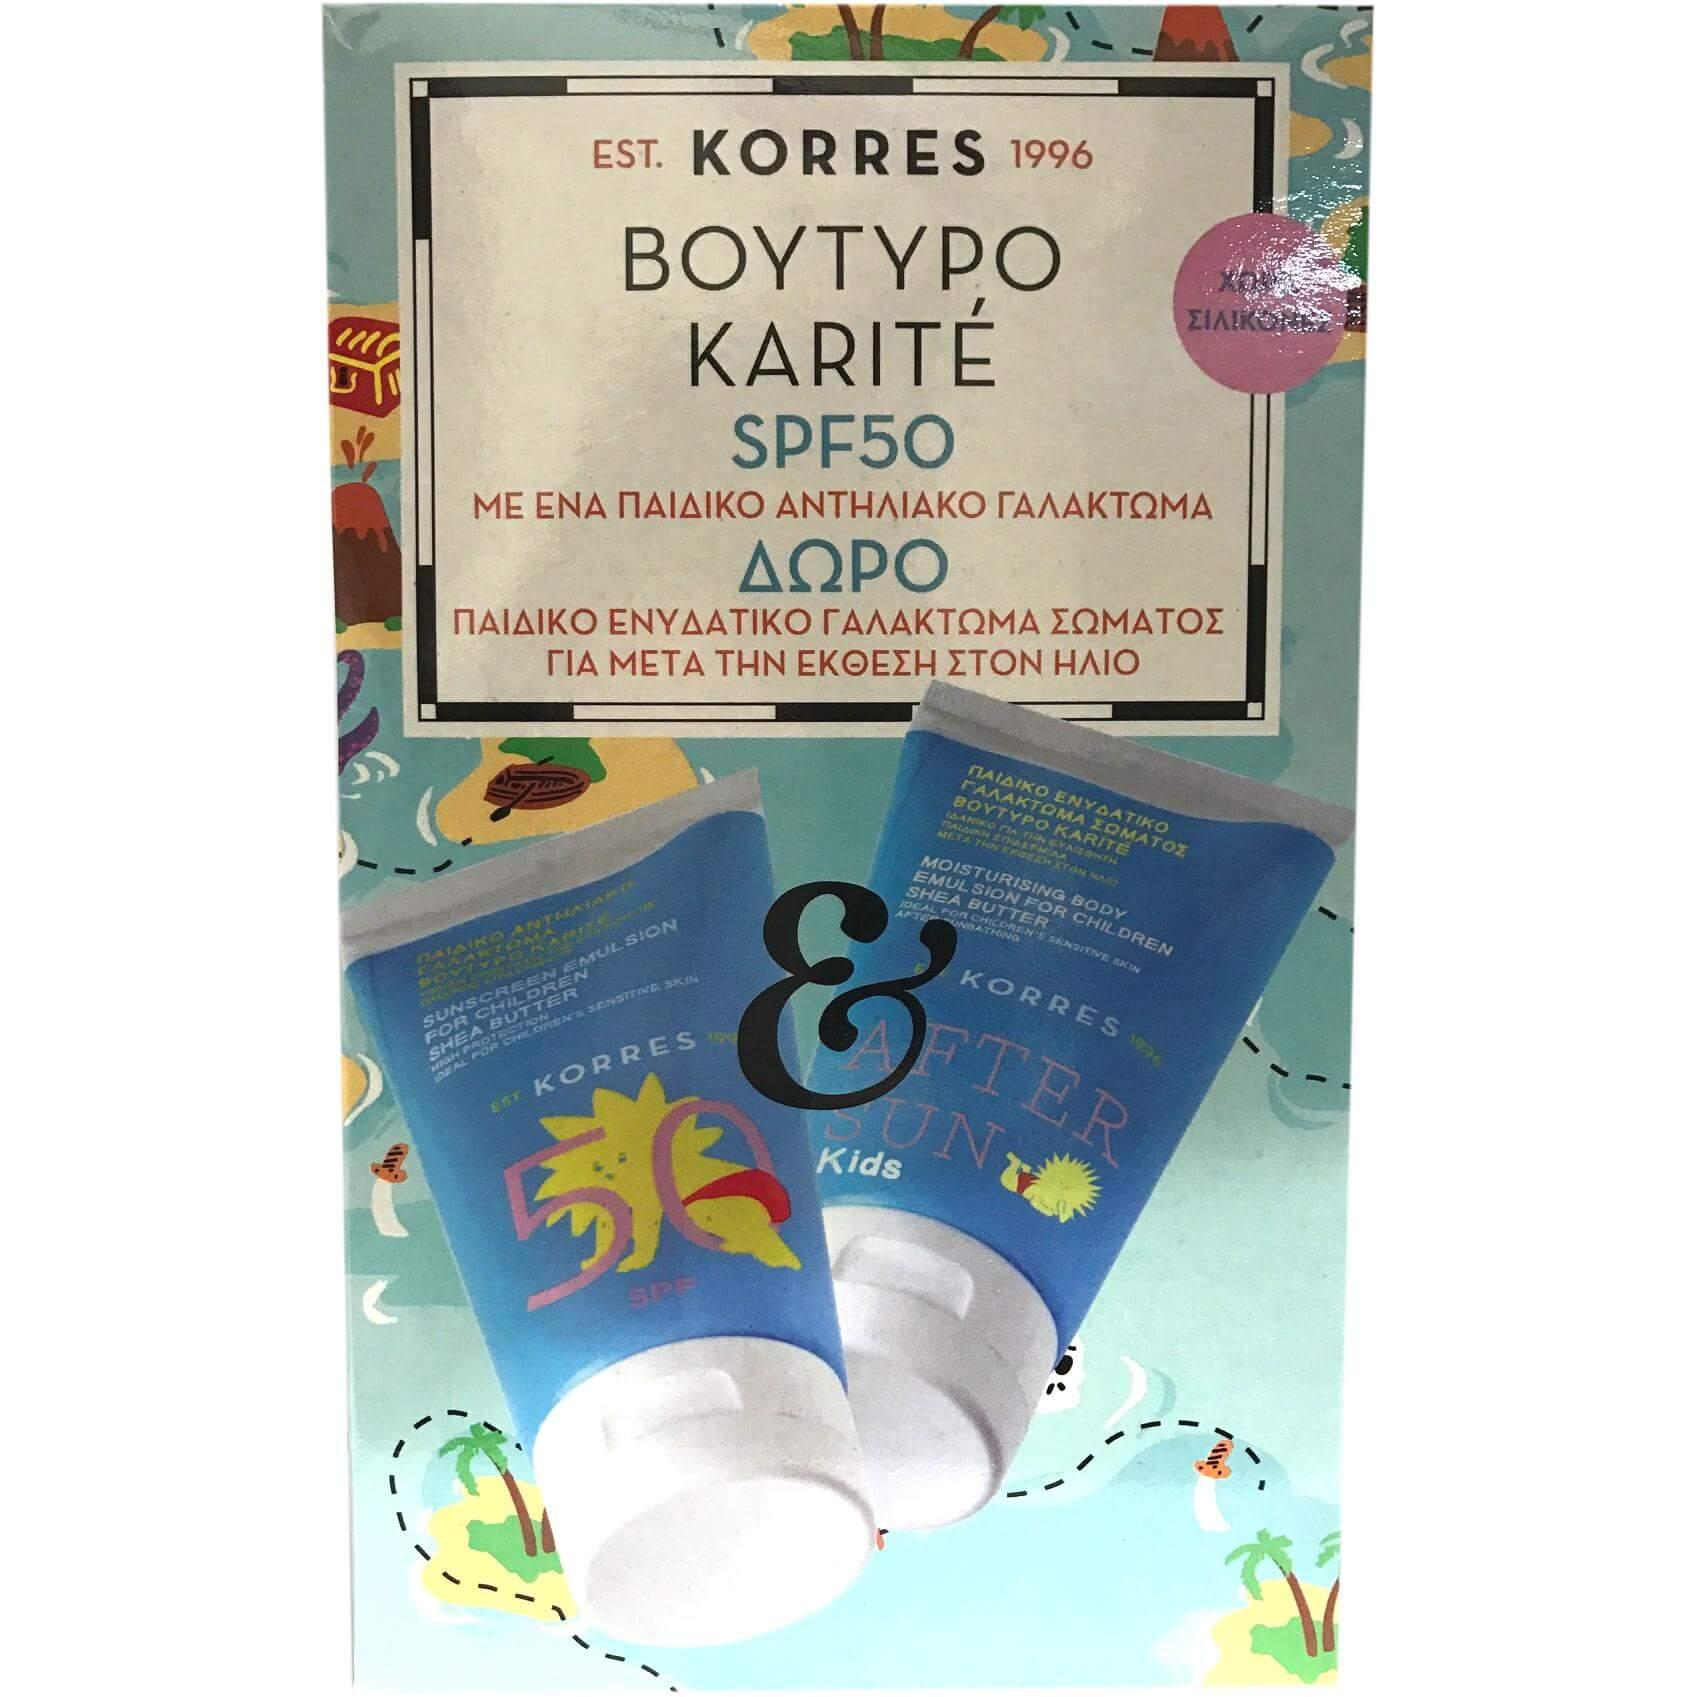 Korres Σετ Βούτυρο Karite Spf50 Παιδικό Αντιηλιακό Γαλάκτωμα 150ml & Δώρο After Sun Παιδικό Ενυδατικό Γαλάκτωμα Σώματος 100ml